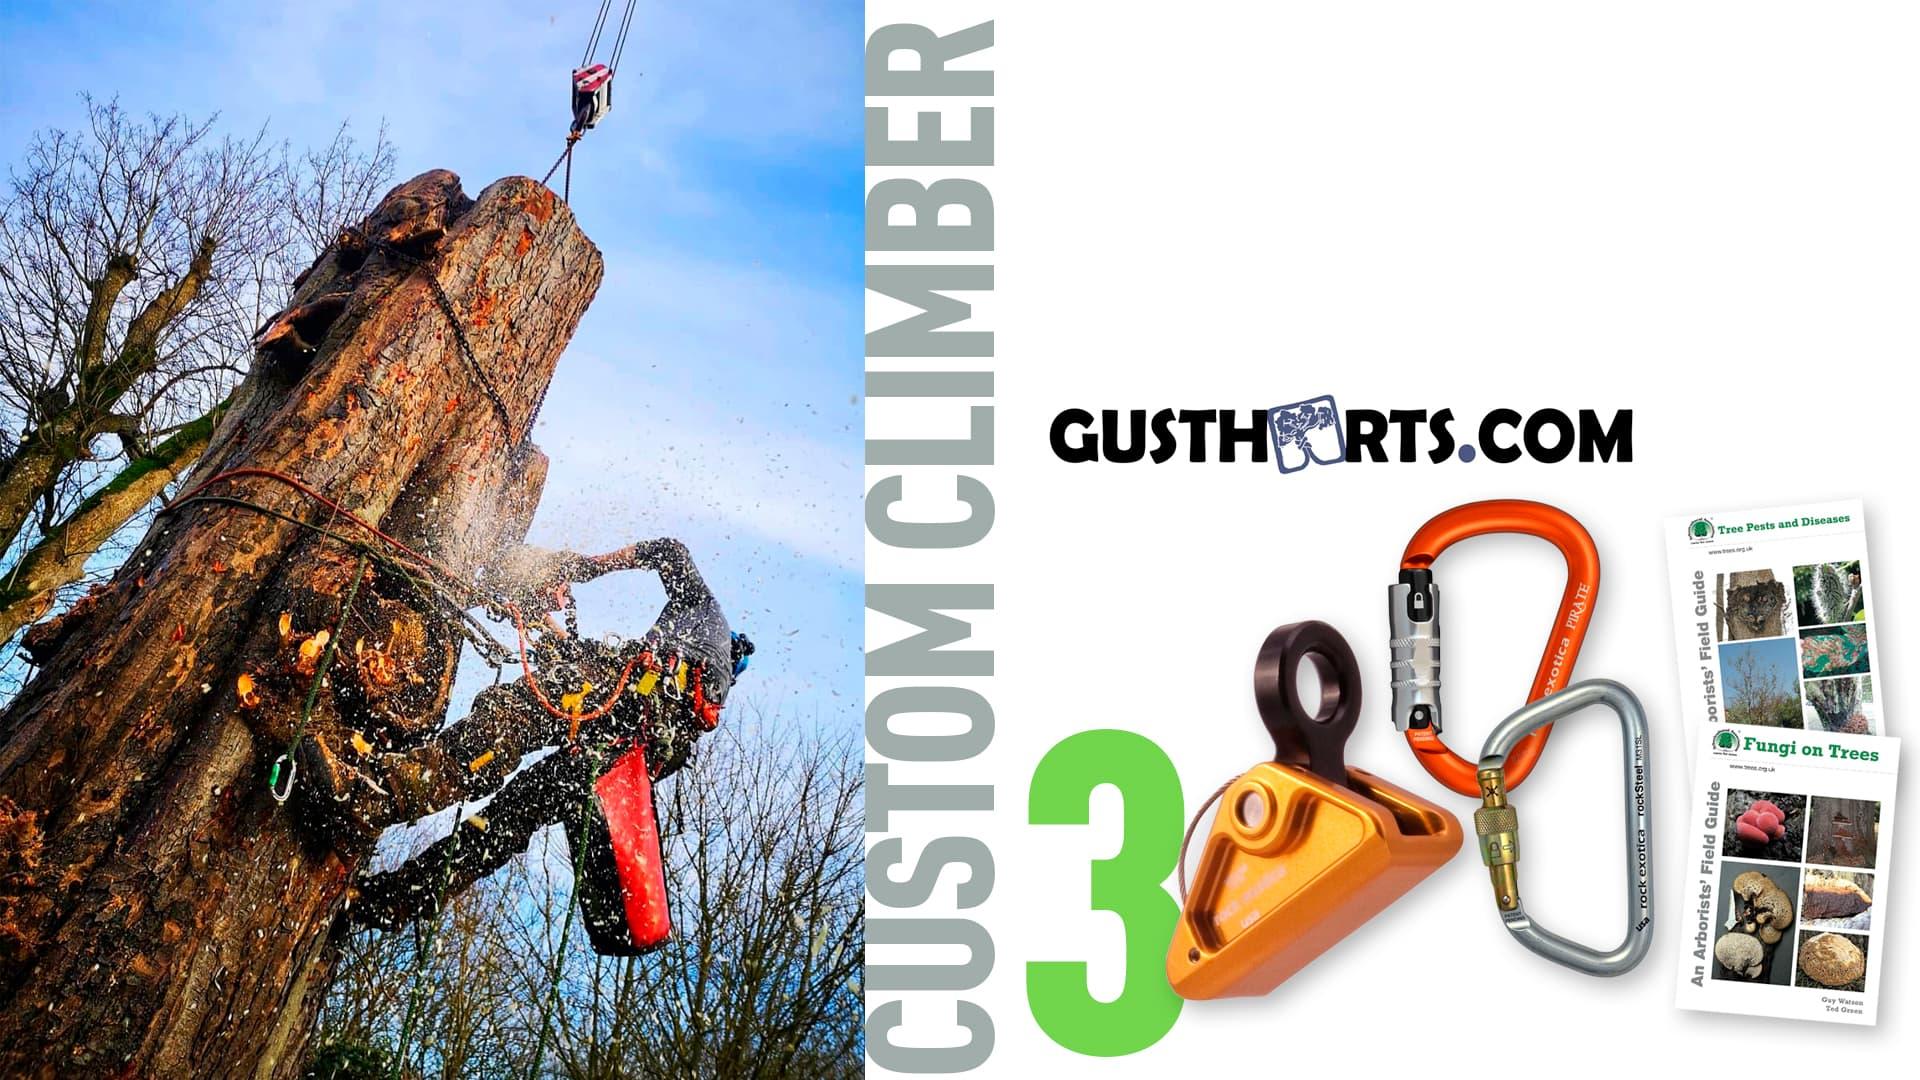 Custom Climber came 3rd in #ARBatWork 2021